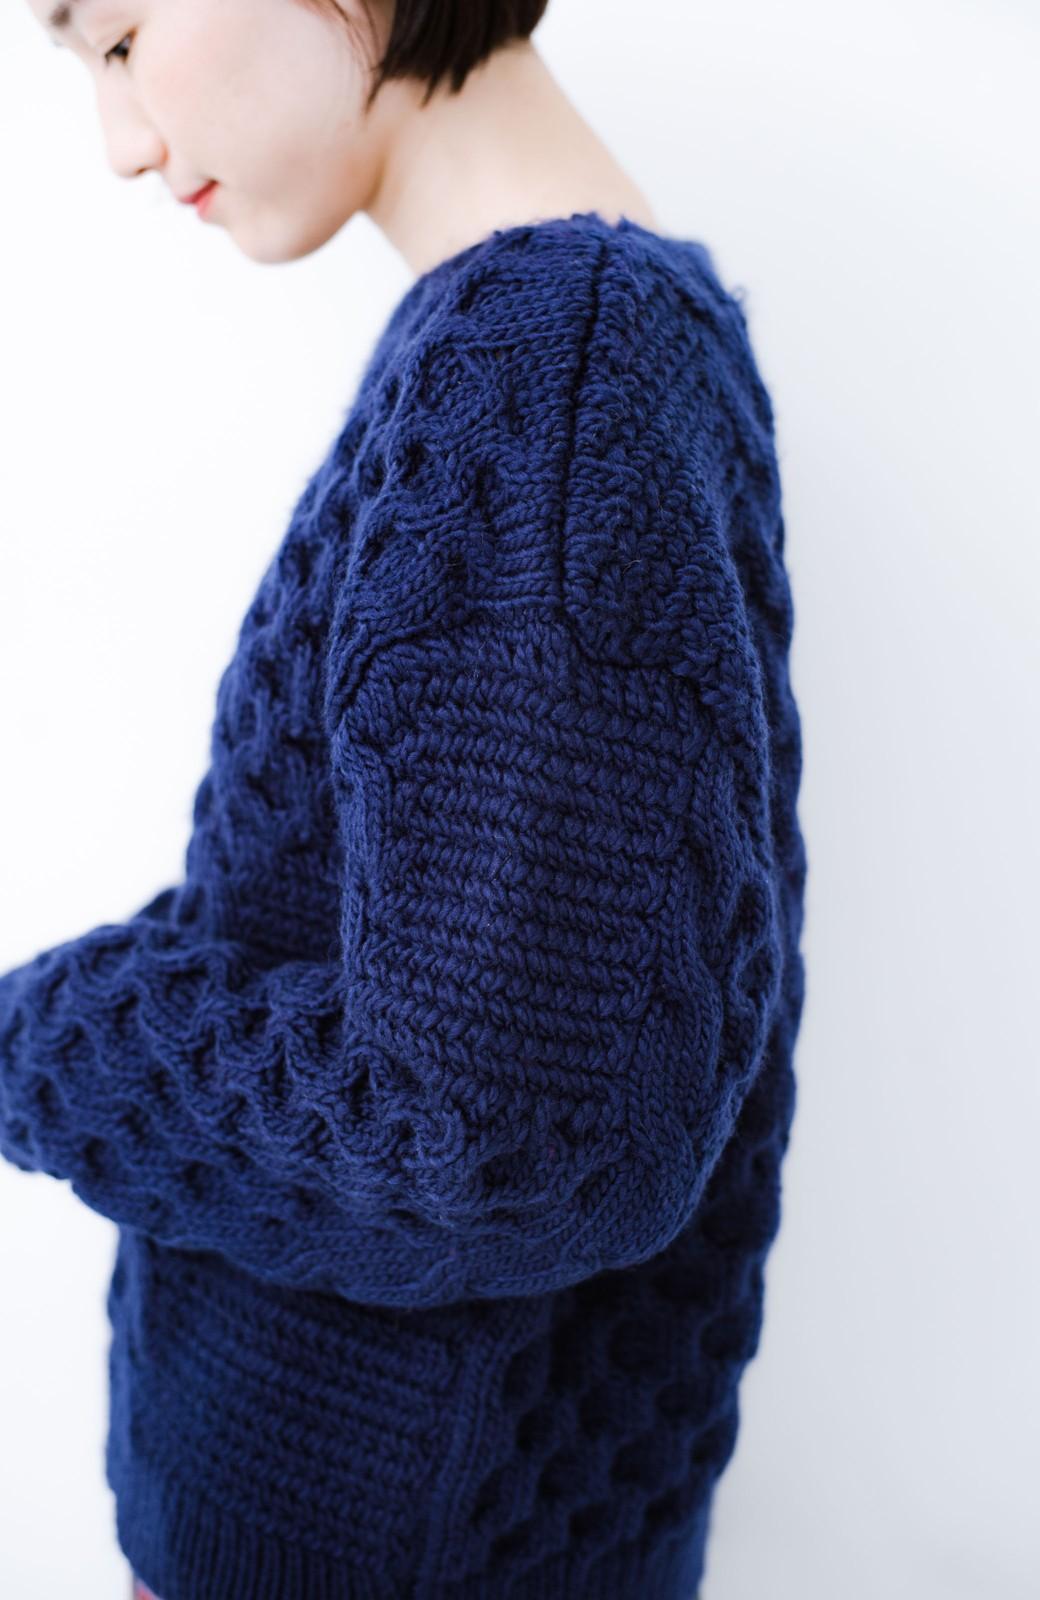 haco! 古着っぽい雰囲気がこなれたパネル編みケーブルニット <ネイビー>の商品写真5